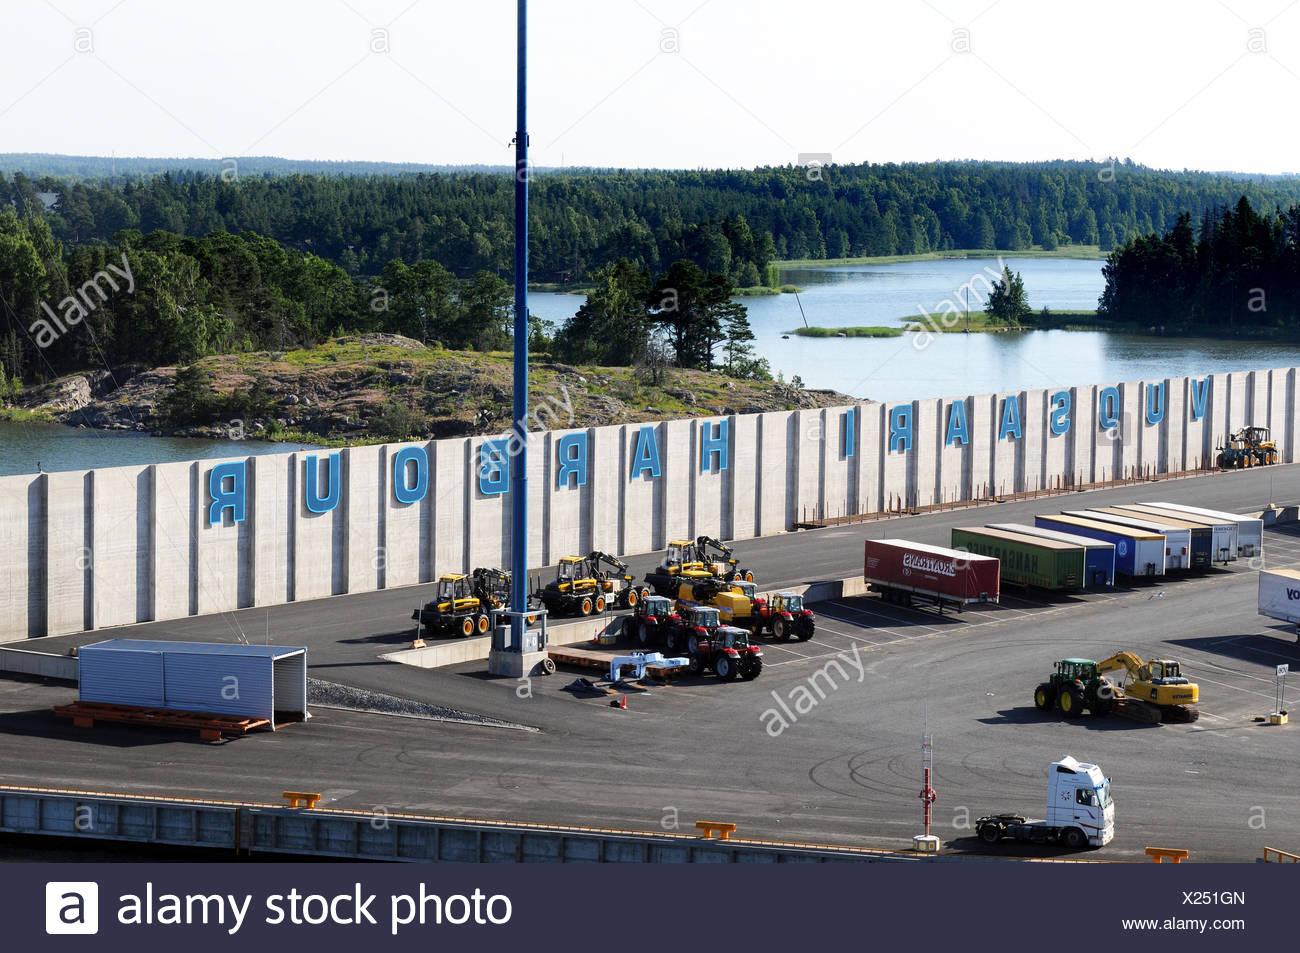 Vuosaaren satama / Vuosaari harbour - Stock Image